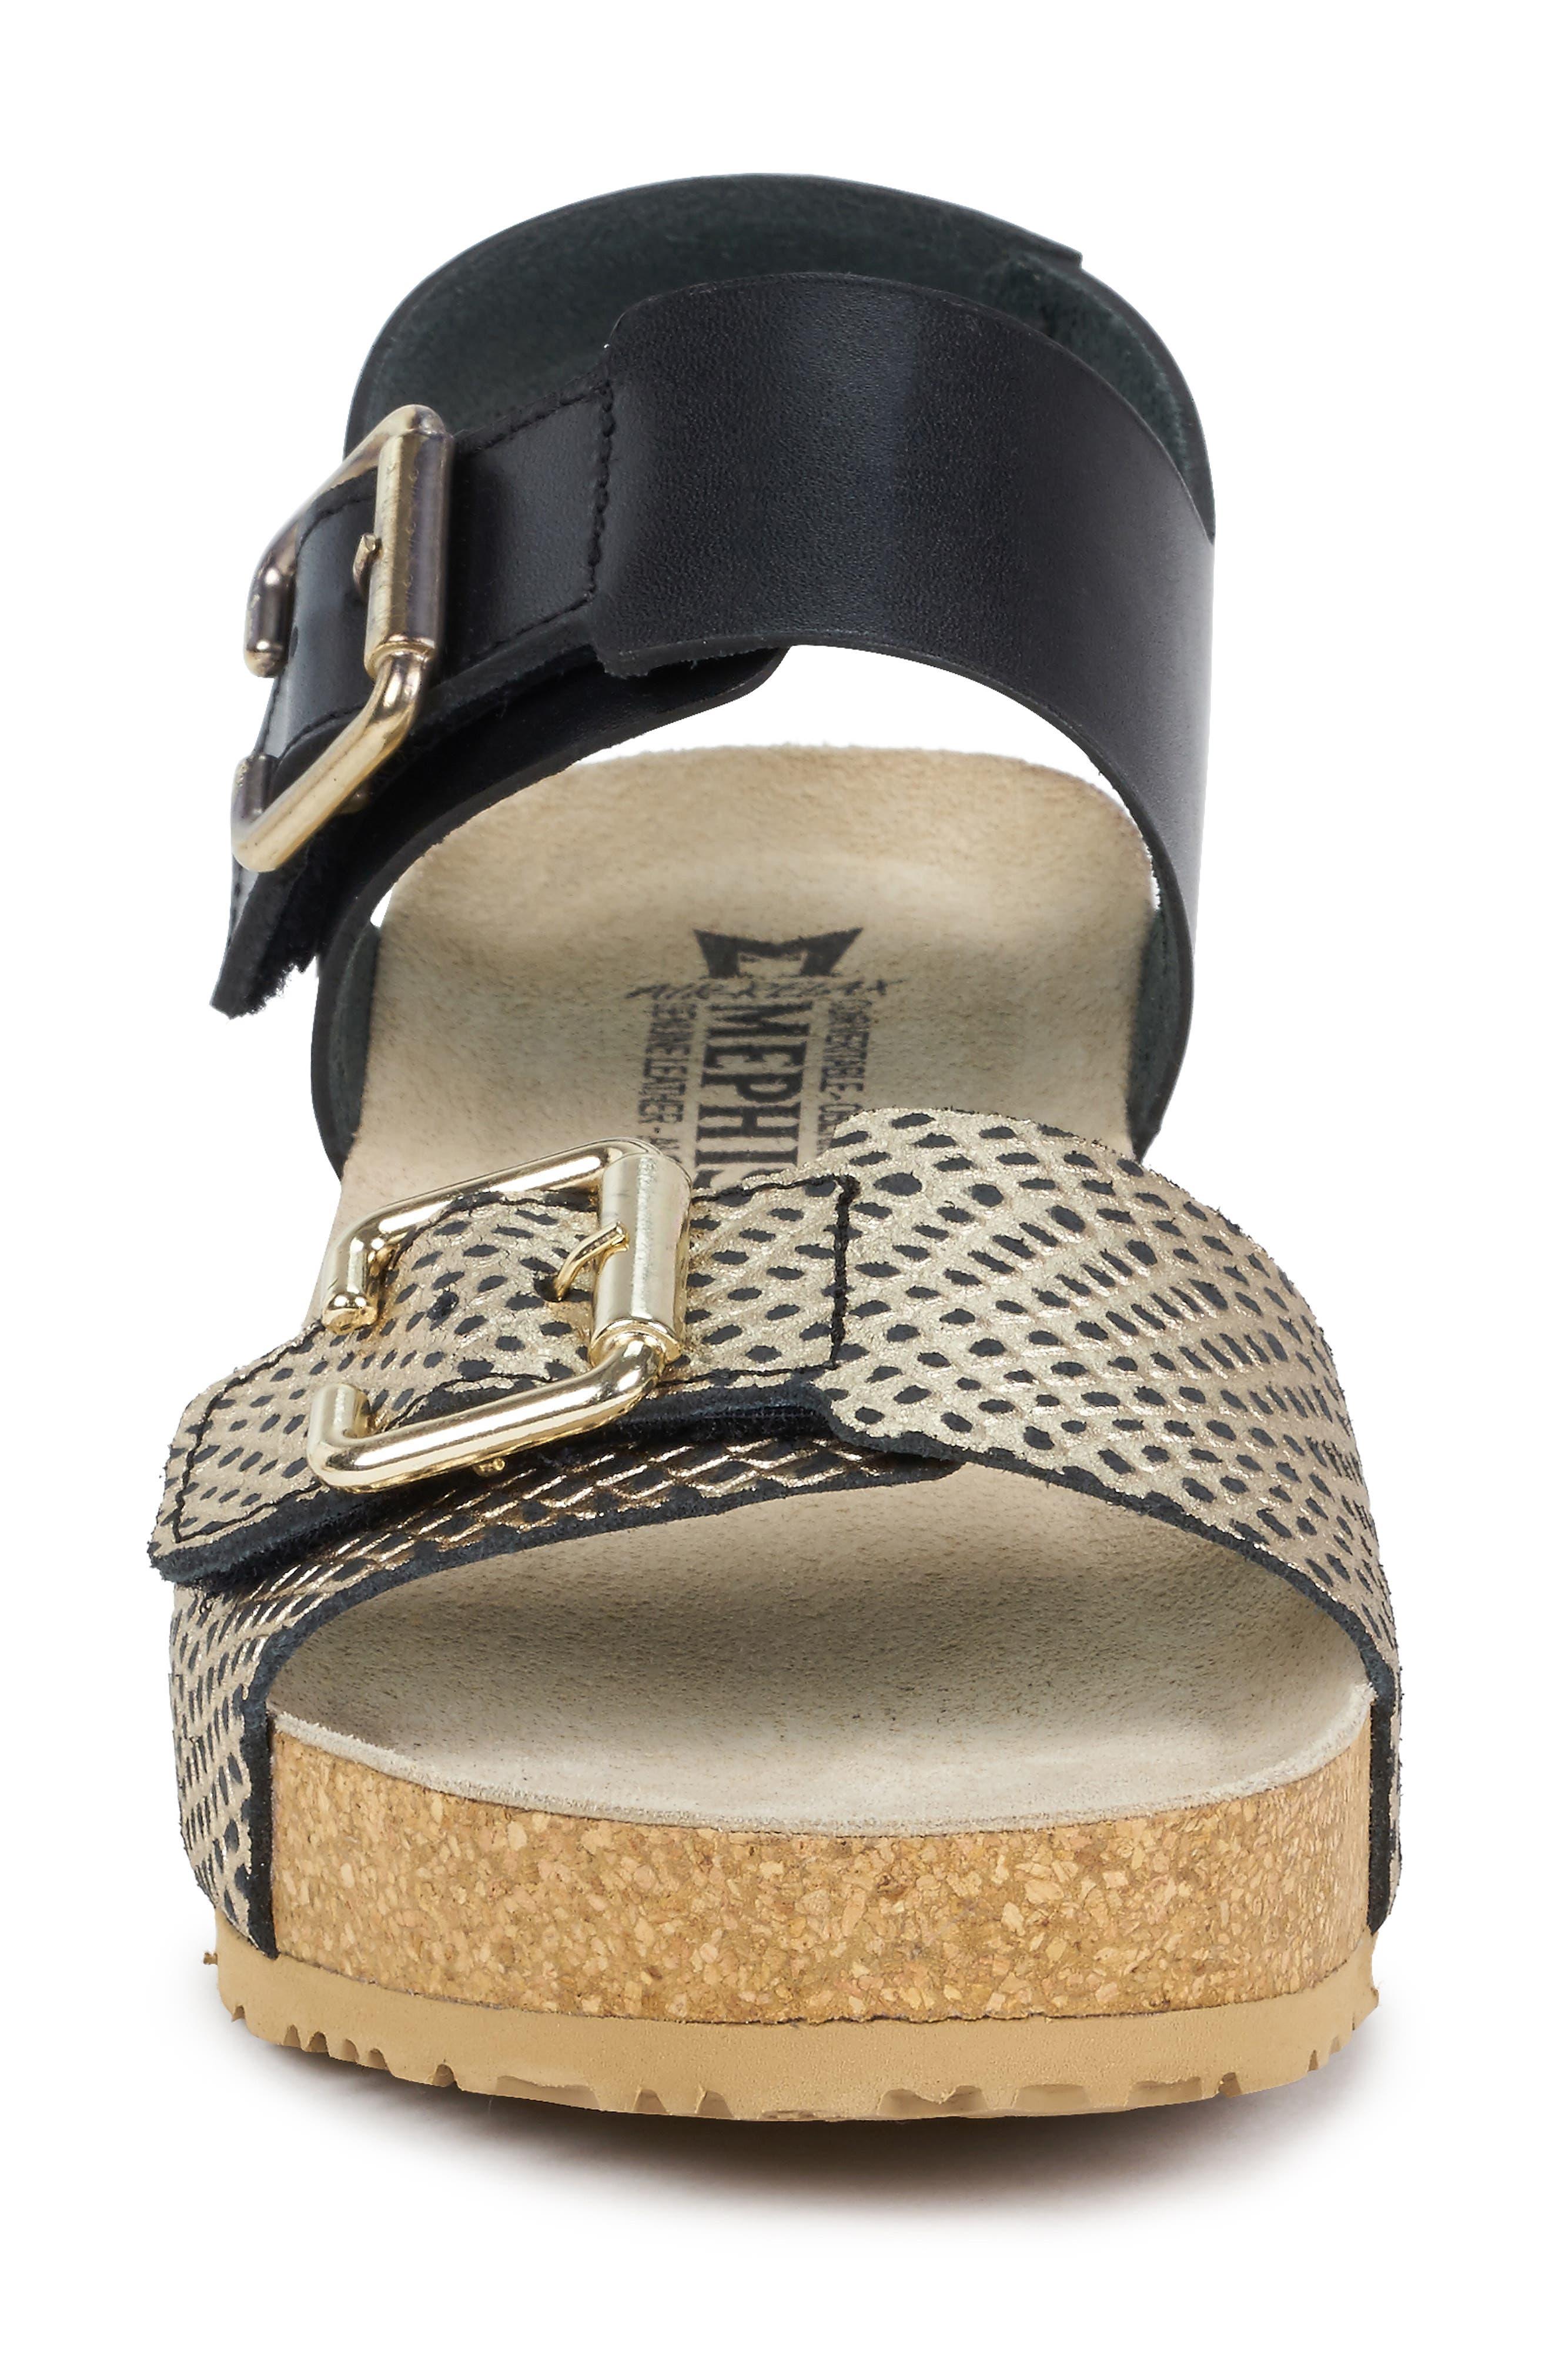 MEPHISTO, Lissandra Platform Wedge Sandal, Alternate thumbnail 4, color, BLACK/ GOLD LEATHER